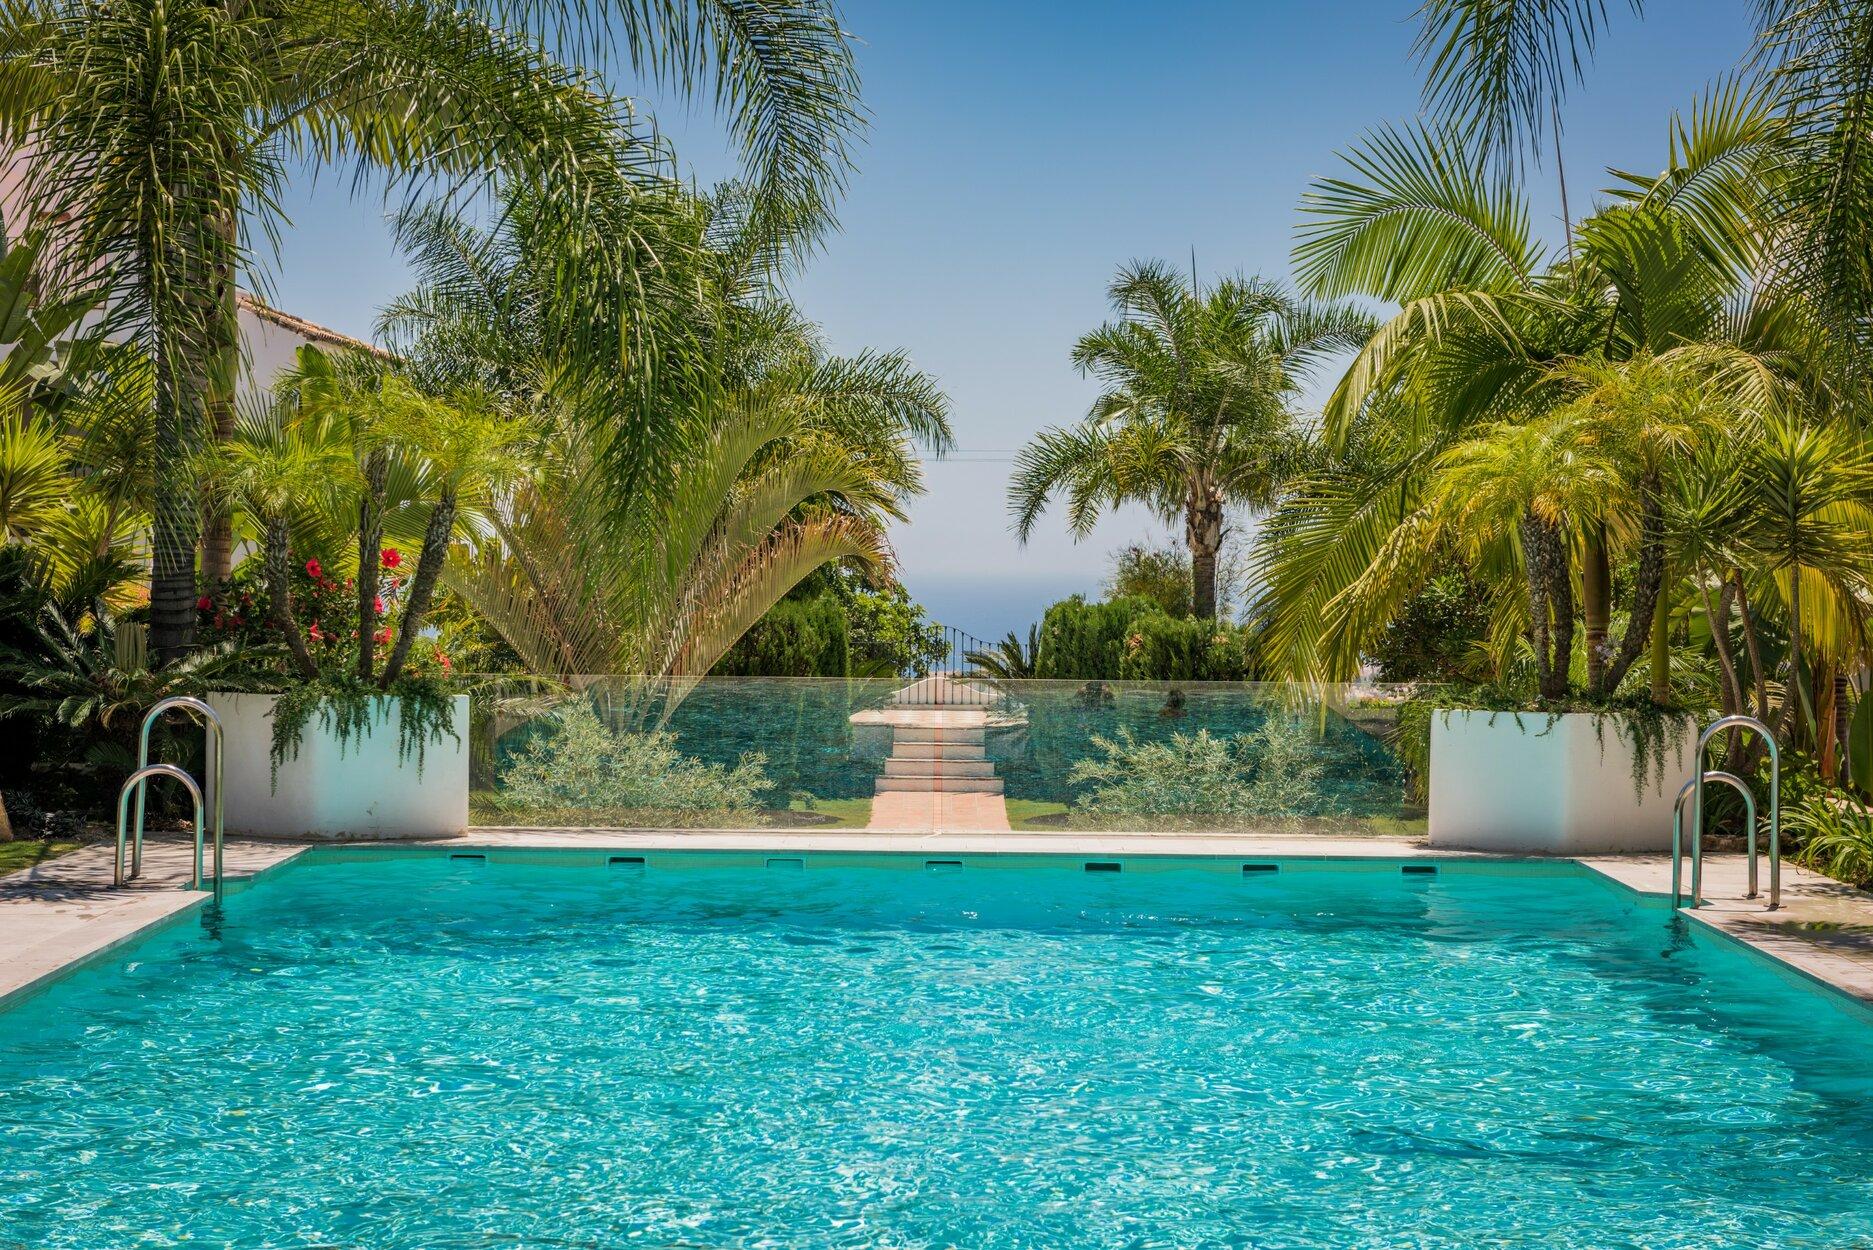 Apartment for rent in Marbella, Montebello Hills